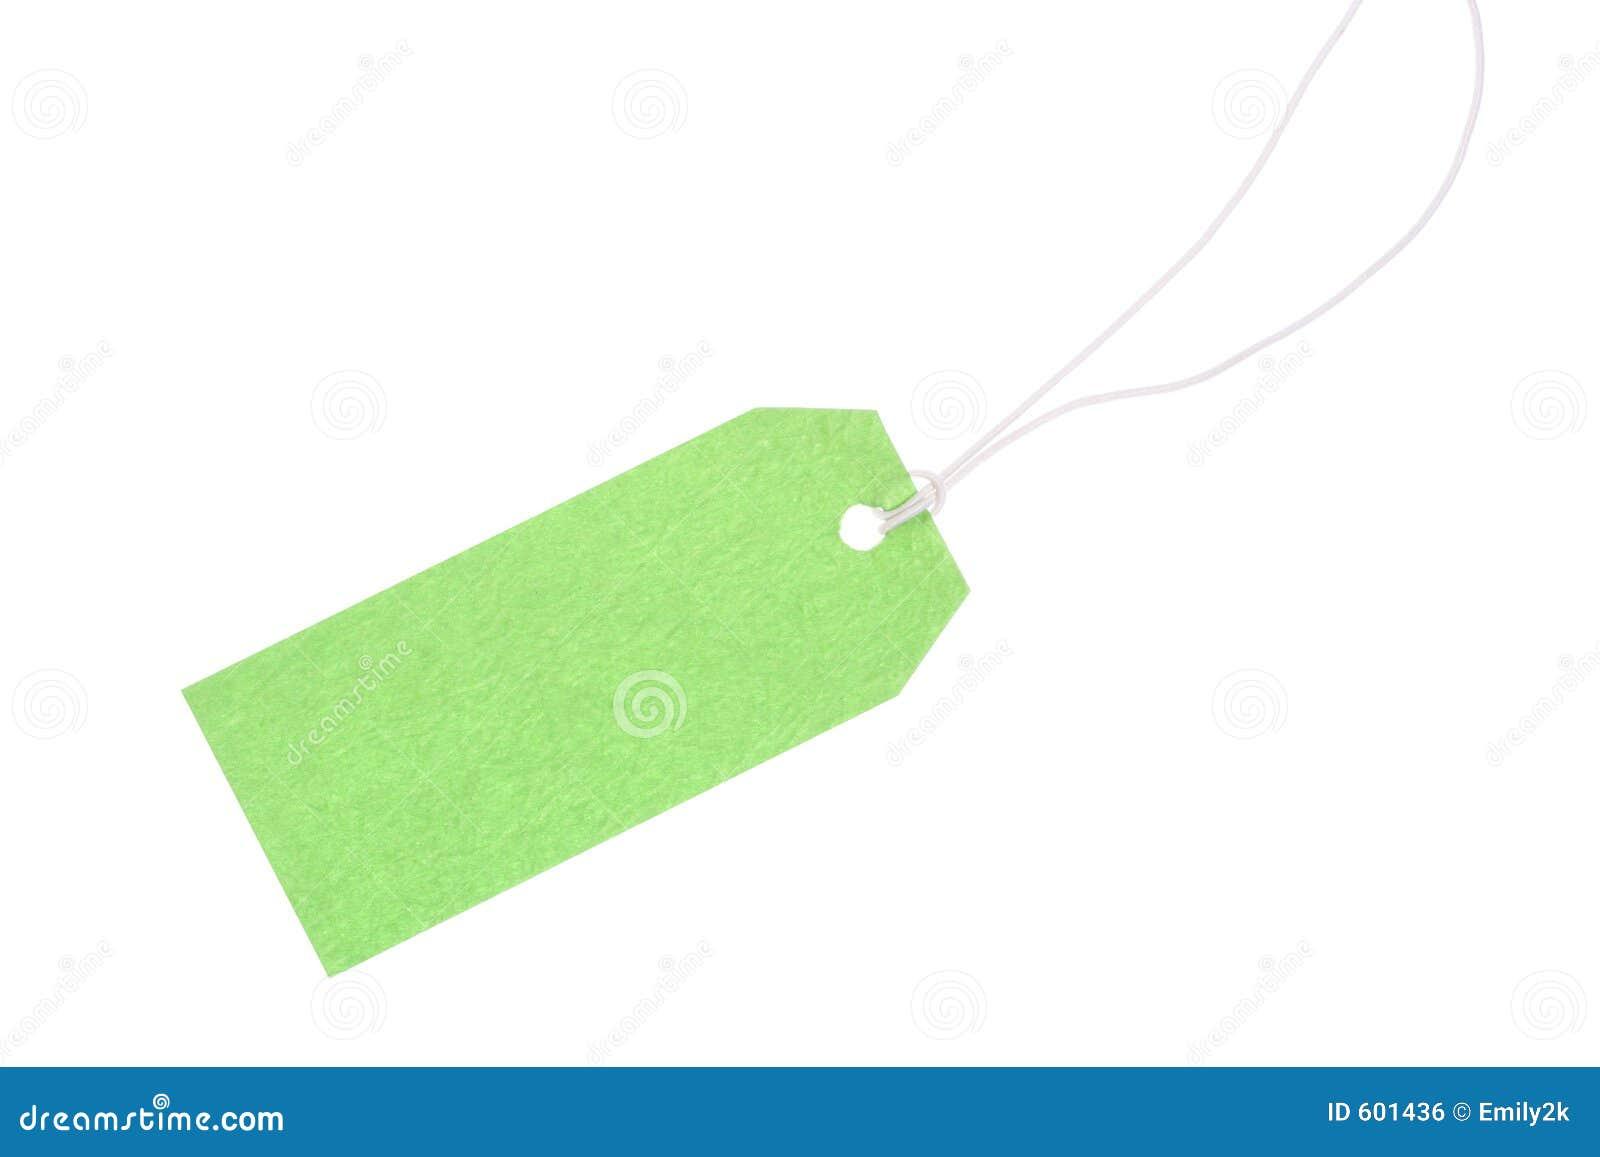 Groene giftmarkering met katoenen draad